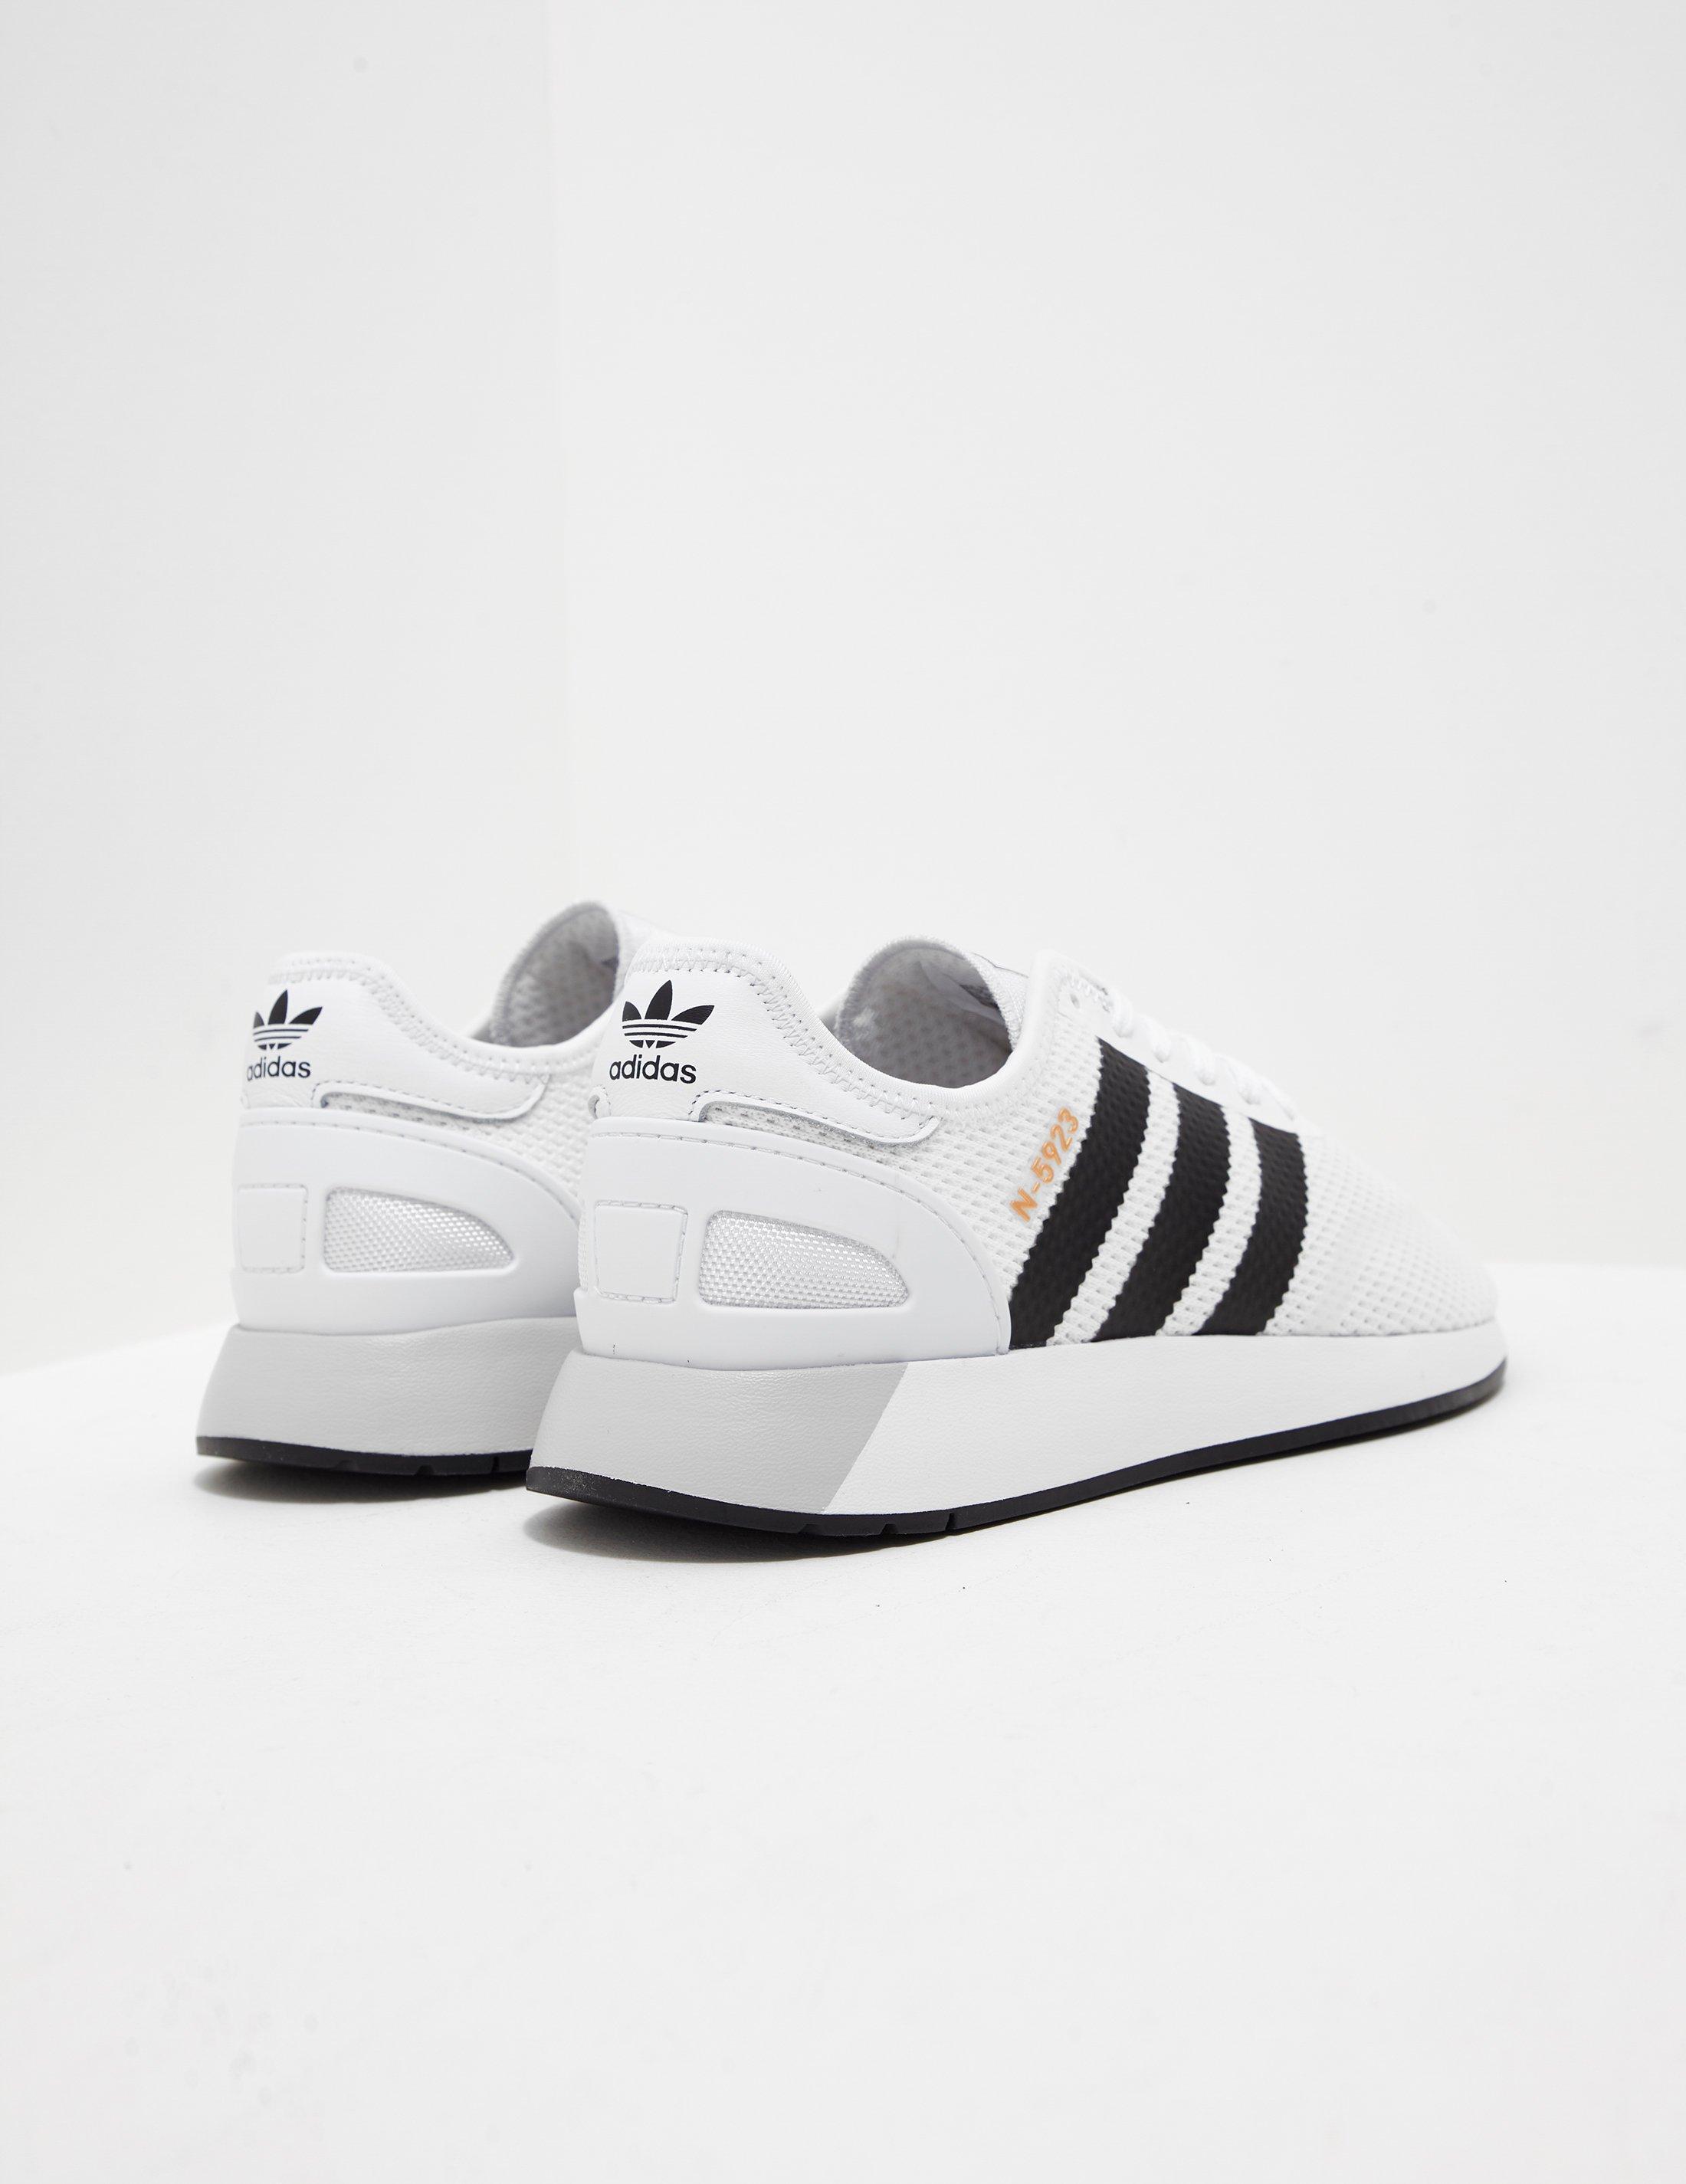 adidas Originals N-5923 - Trainers - clear orange/footwear white/core black QcHH0w